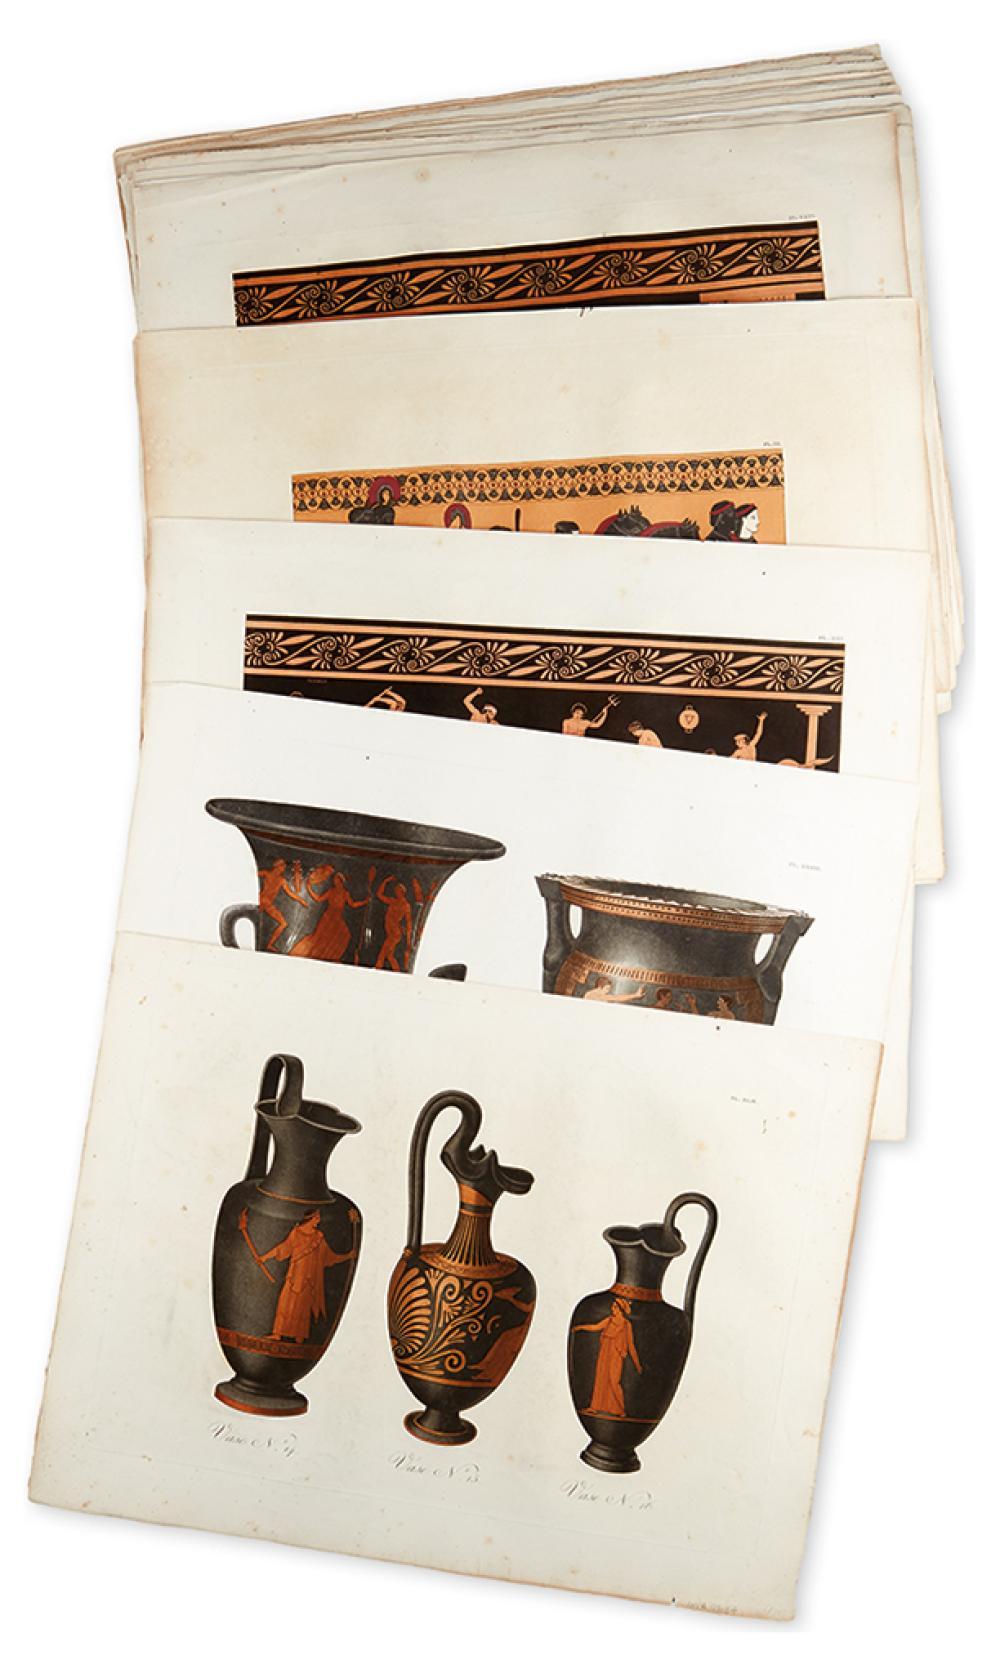 (GREEK ANTIQUITIES.) De Laborde, Alexandre. 20 color-printed aquatint and engraved plates,